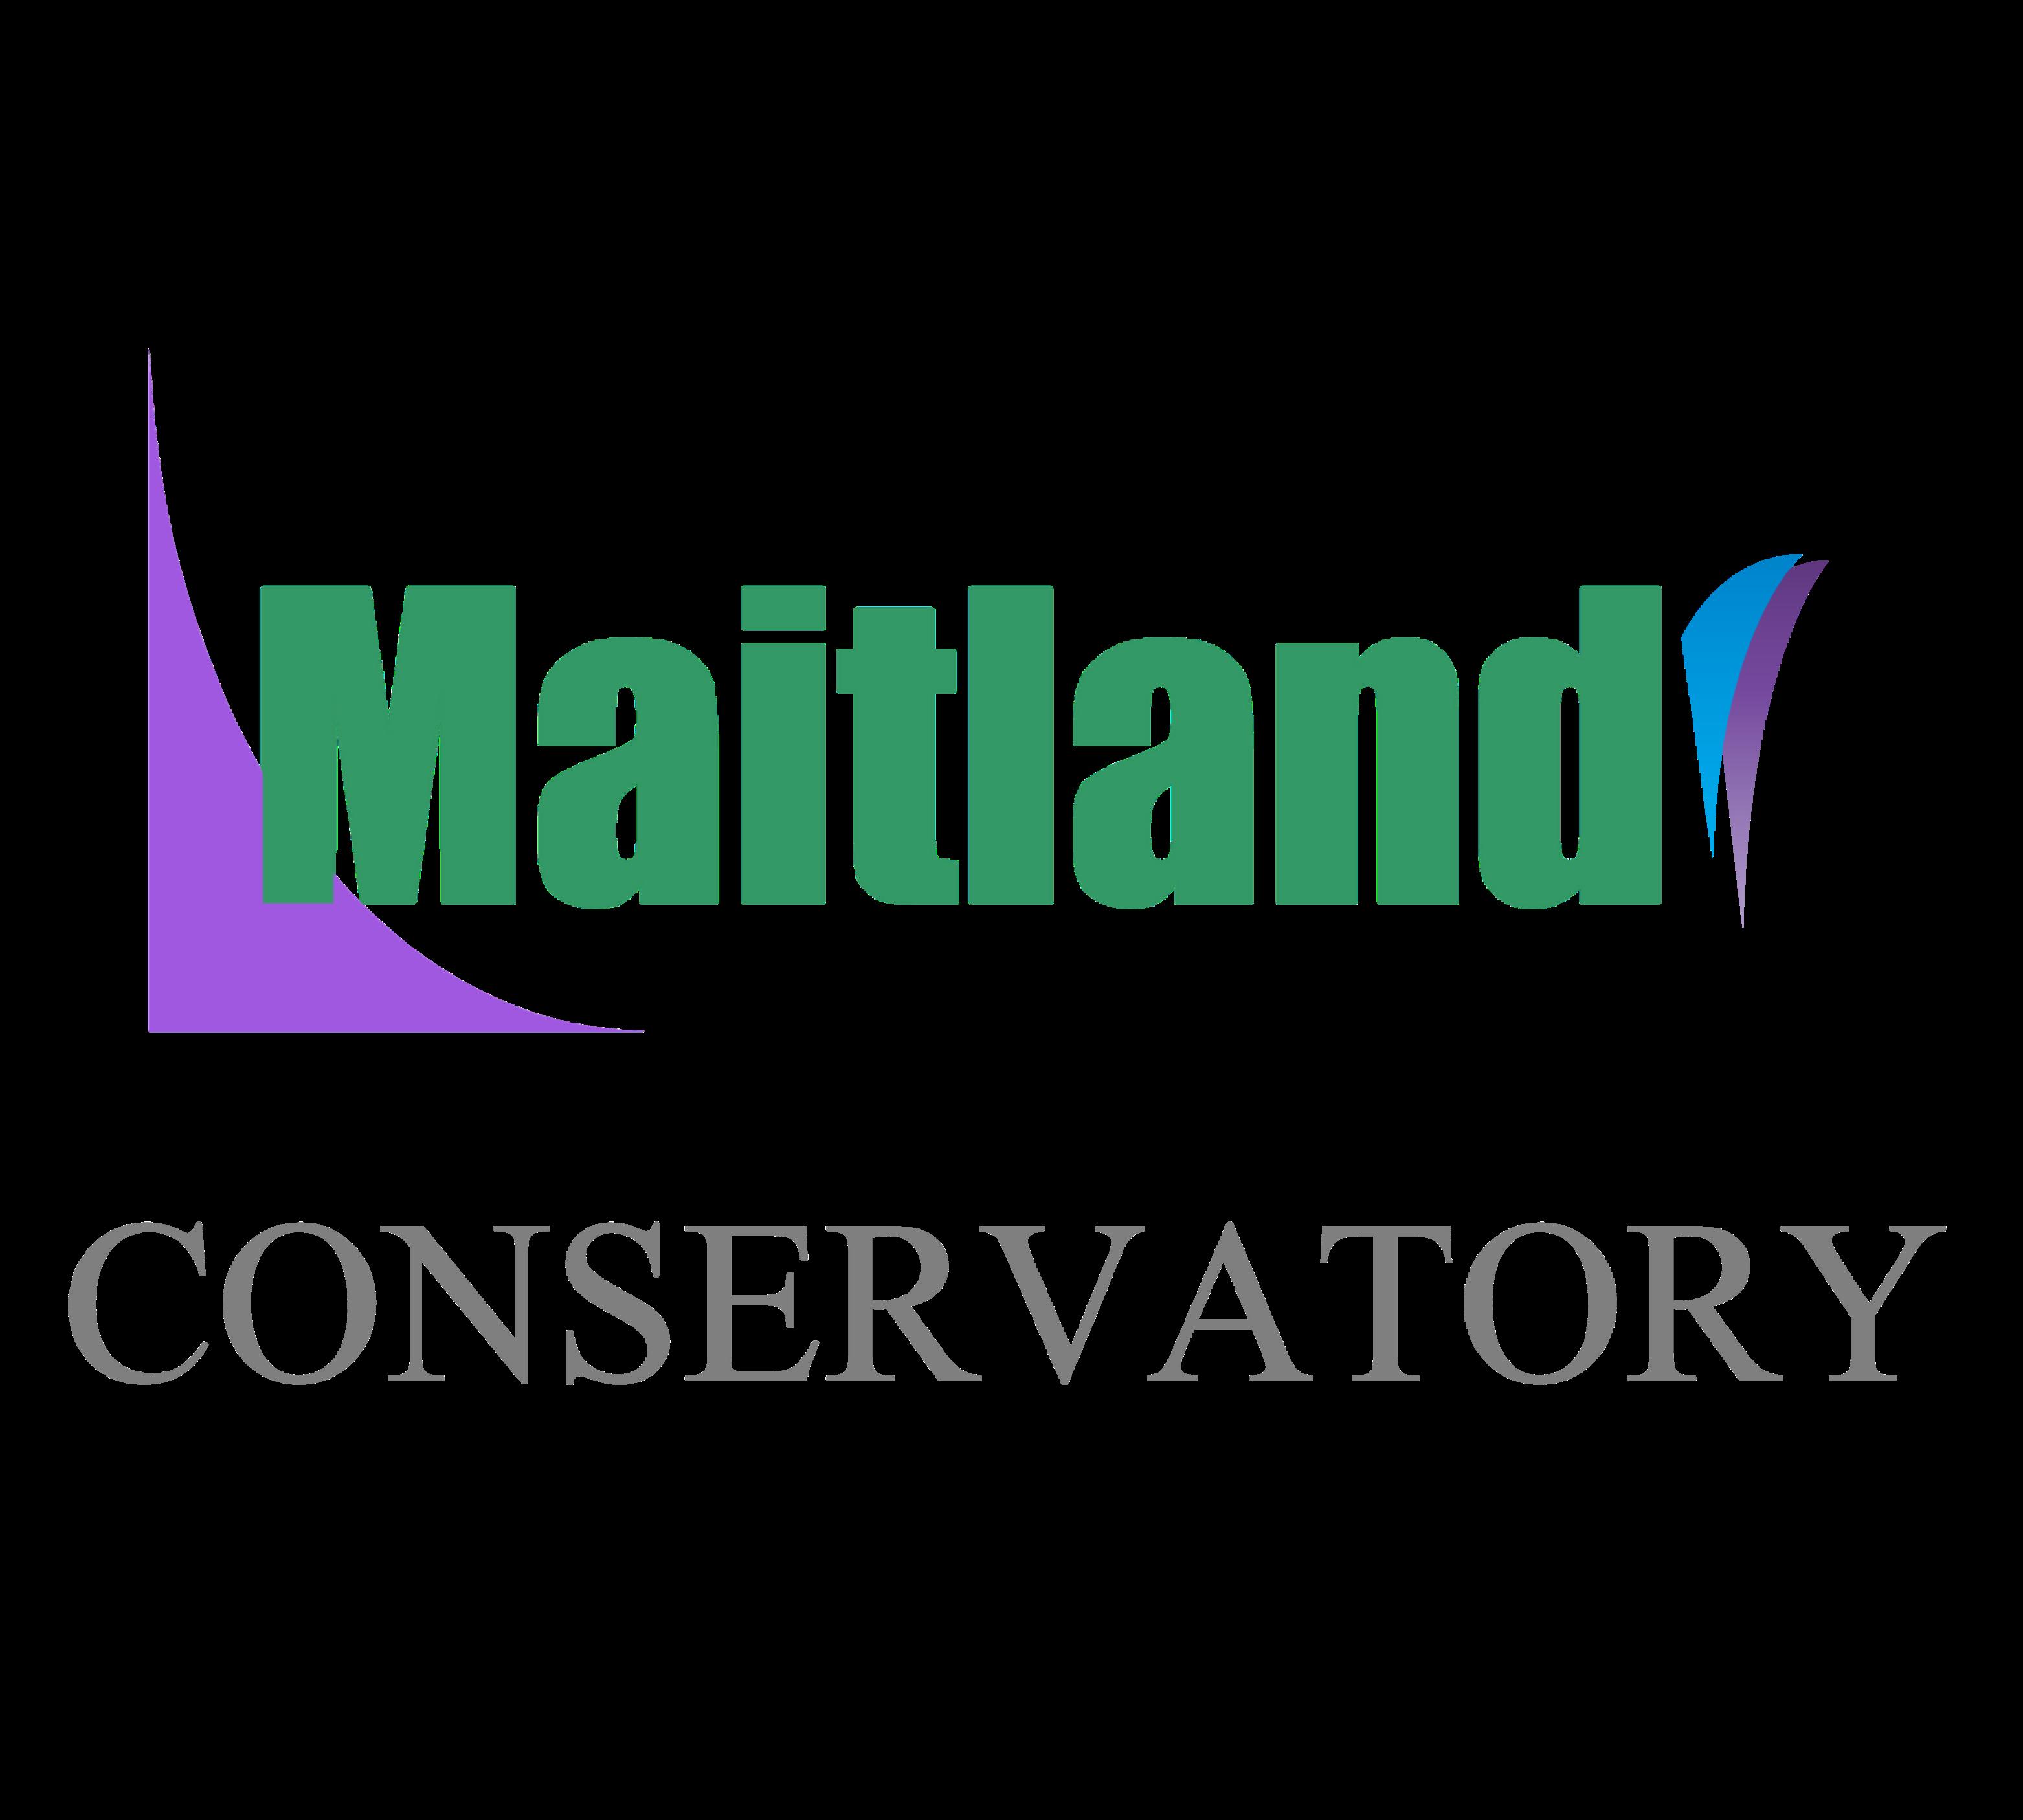 Maitland Conservatory